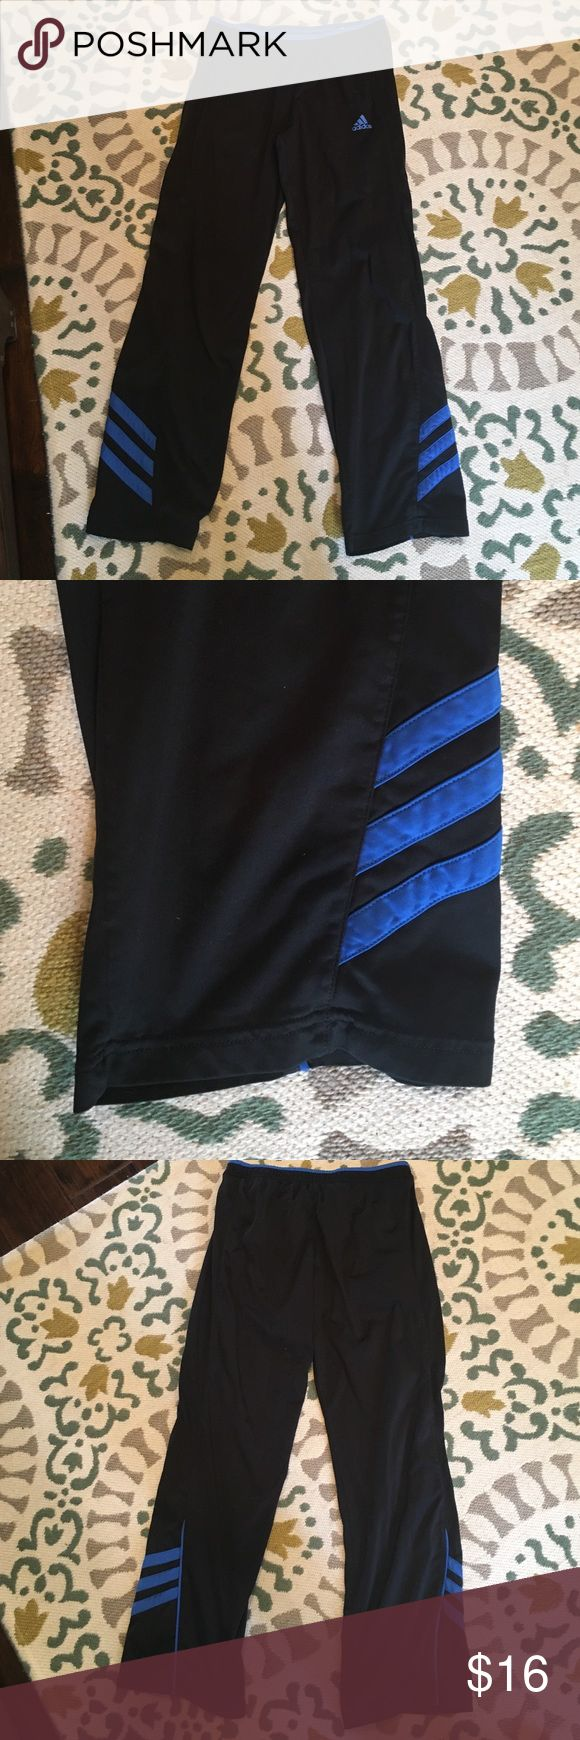 Black and Blue Adidas Sweatpants Boy's black and blue adidas sweatpants. Size medium Adidas Bottoms Sweatpants & Joggers